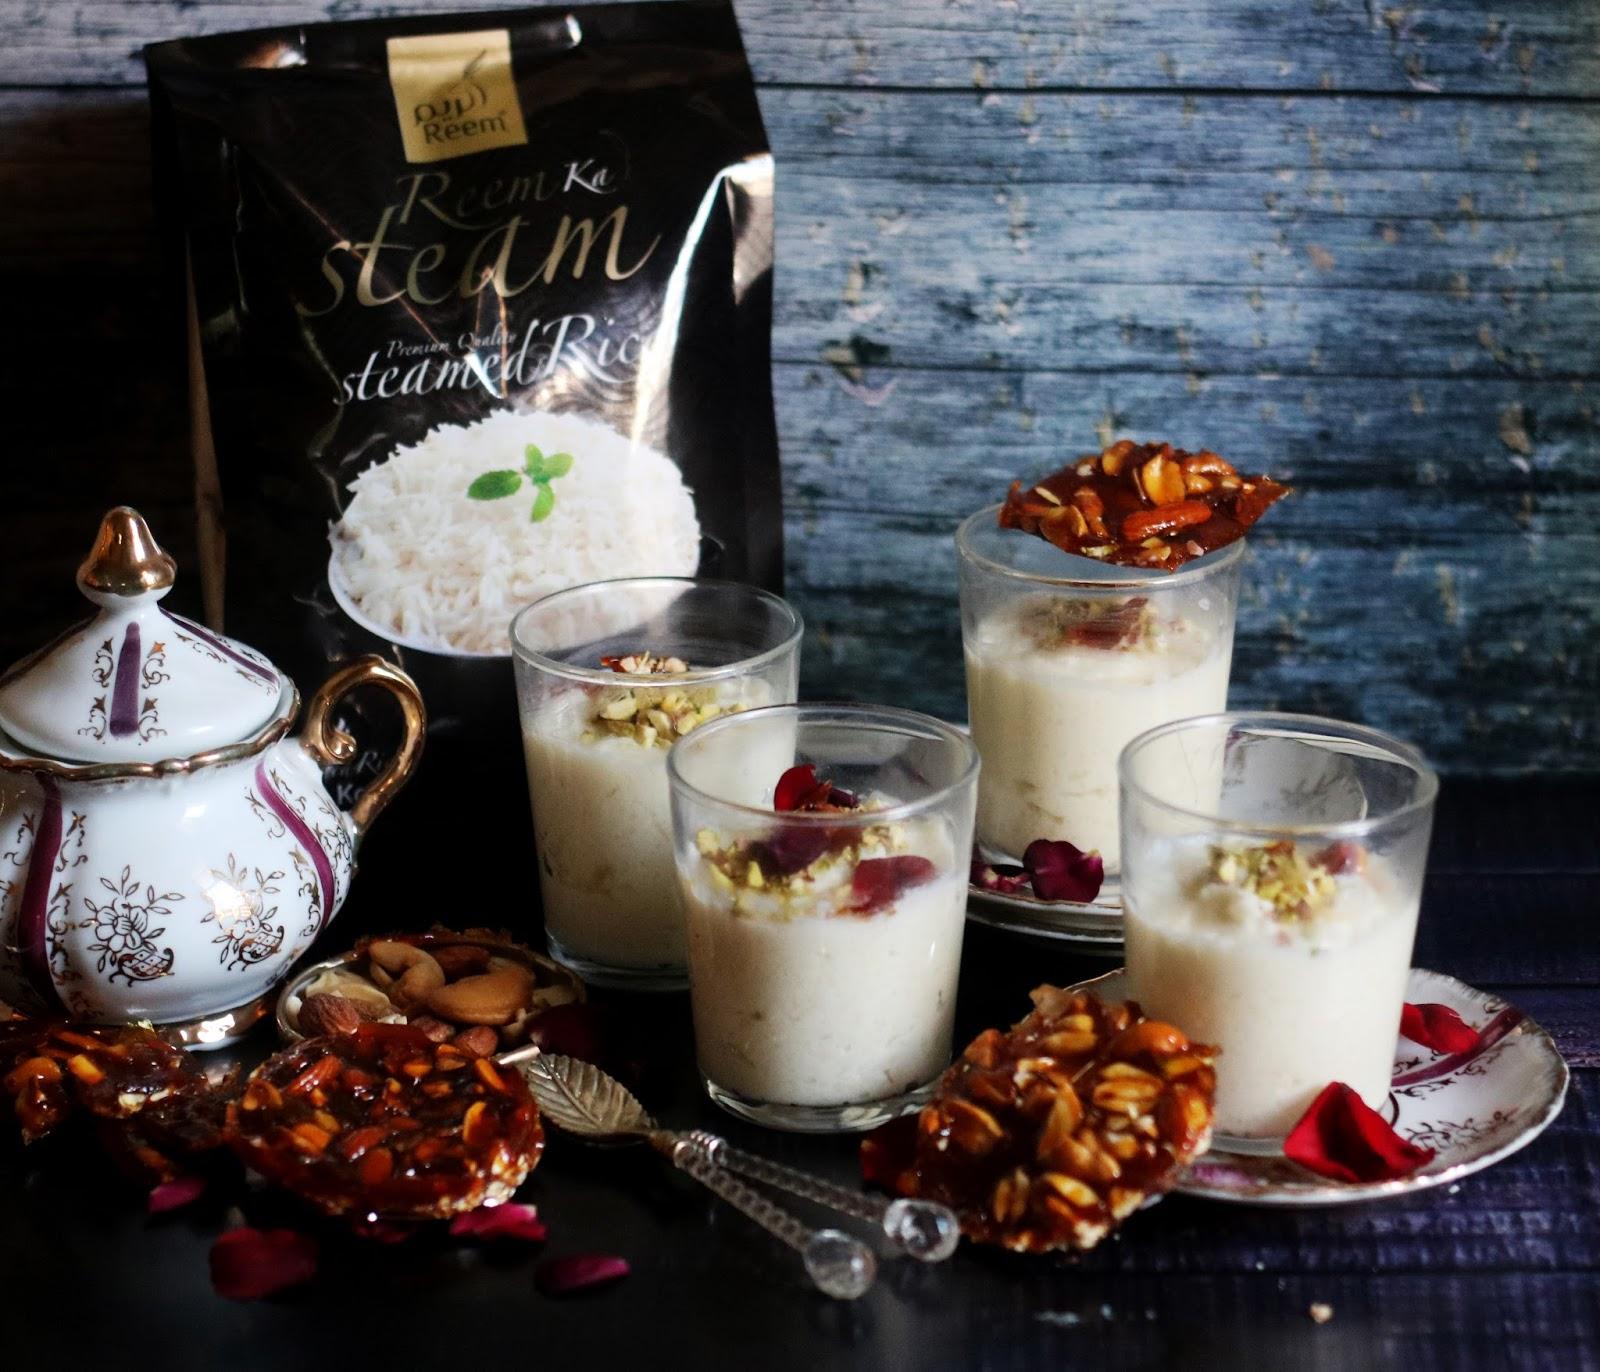 Firni-Reem-ka-Steam-Rice-Pudding-TTTB